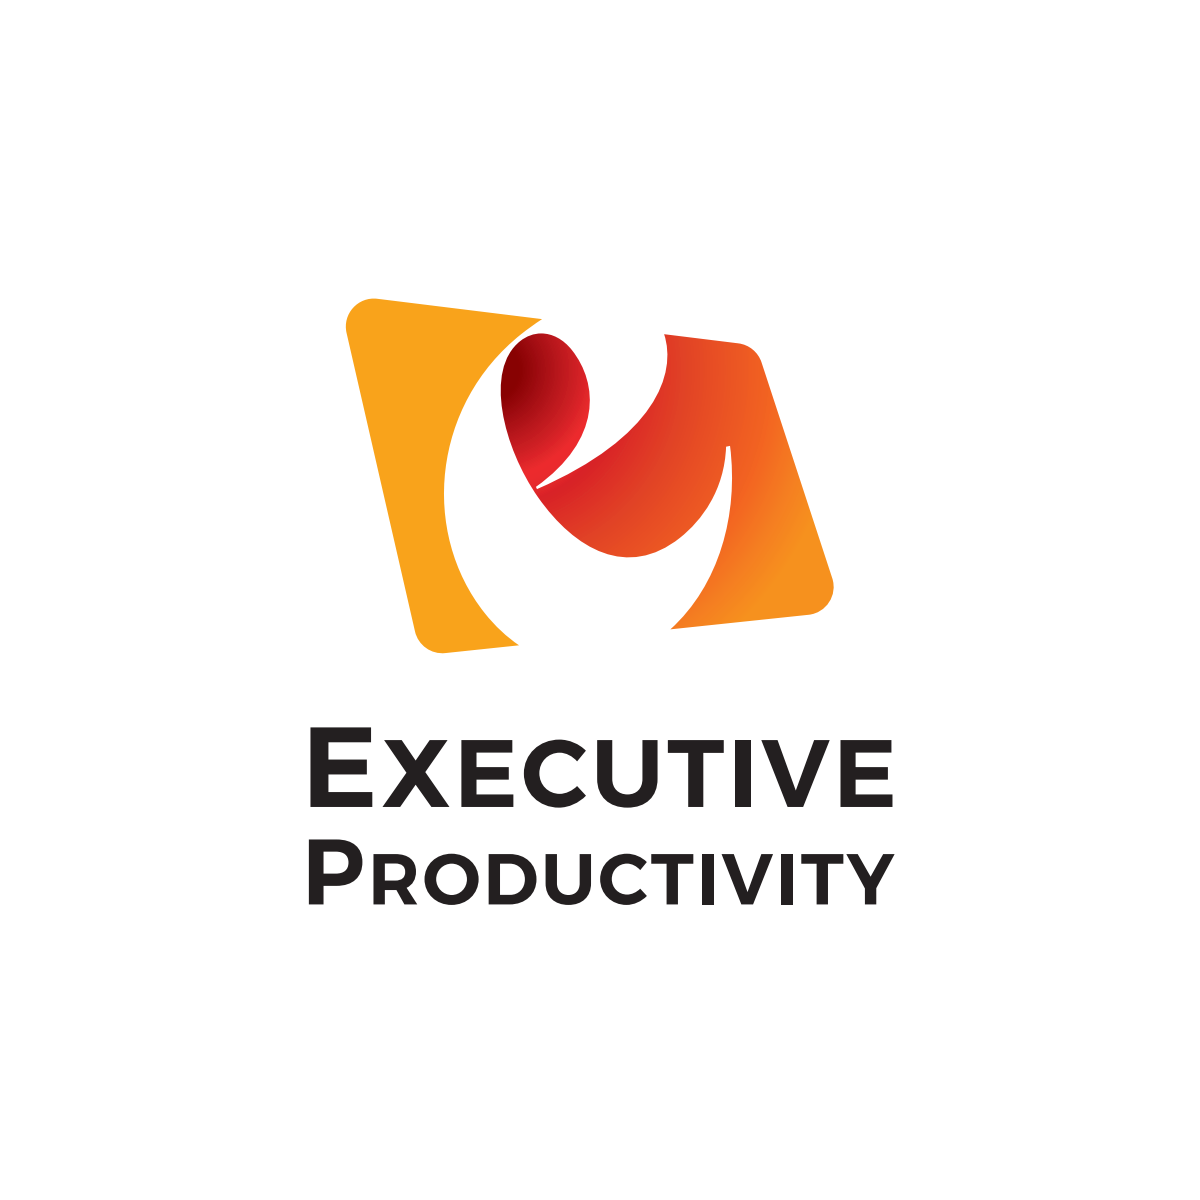 Executive Productivity Branding